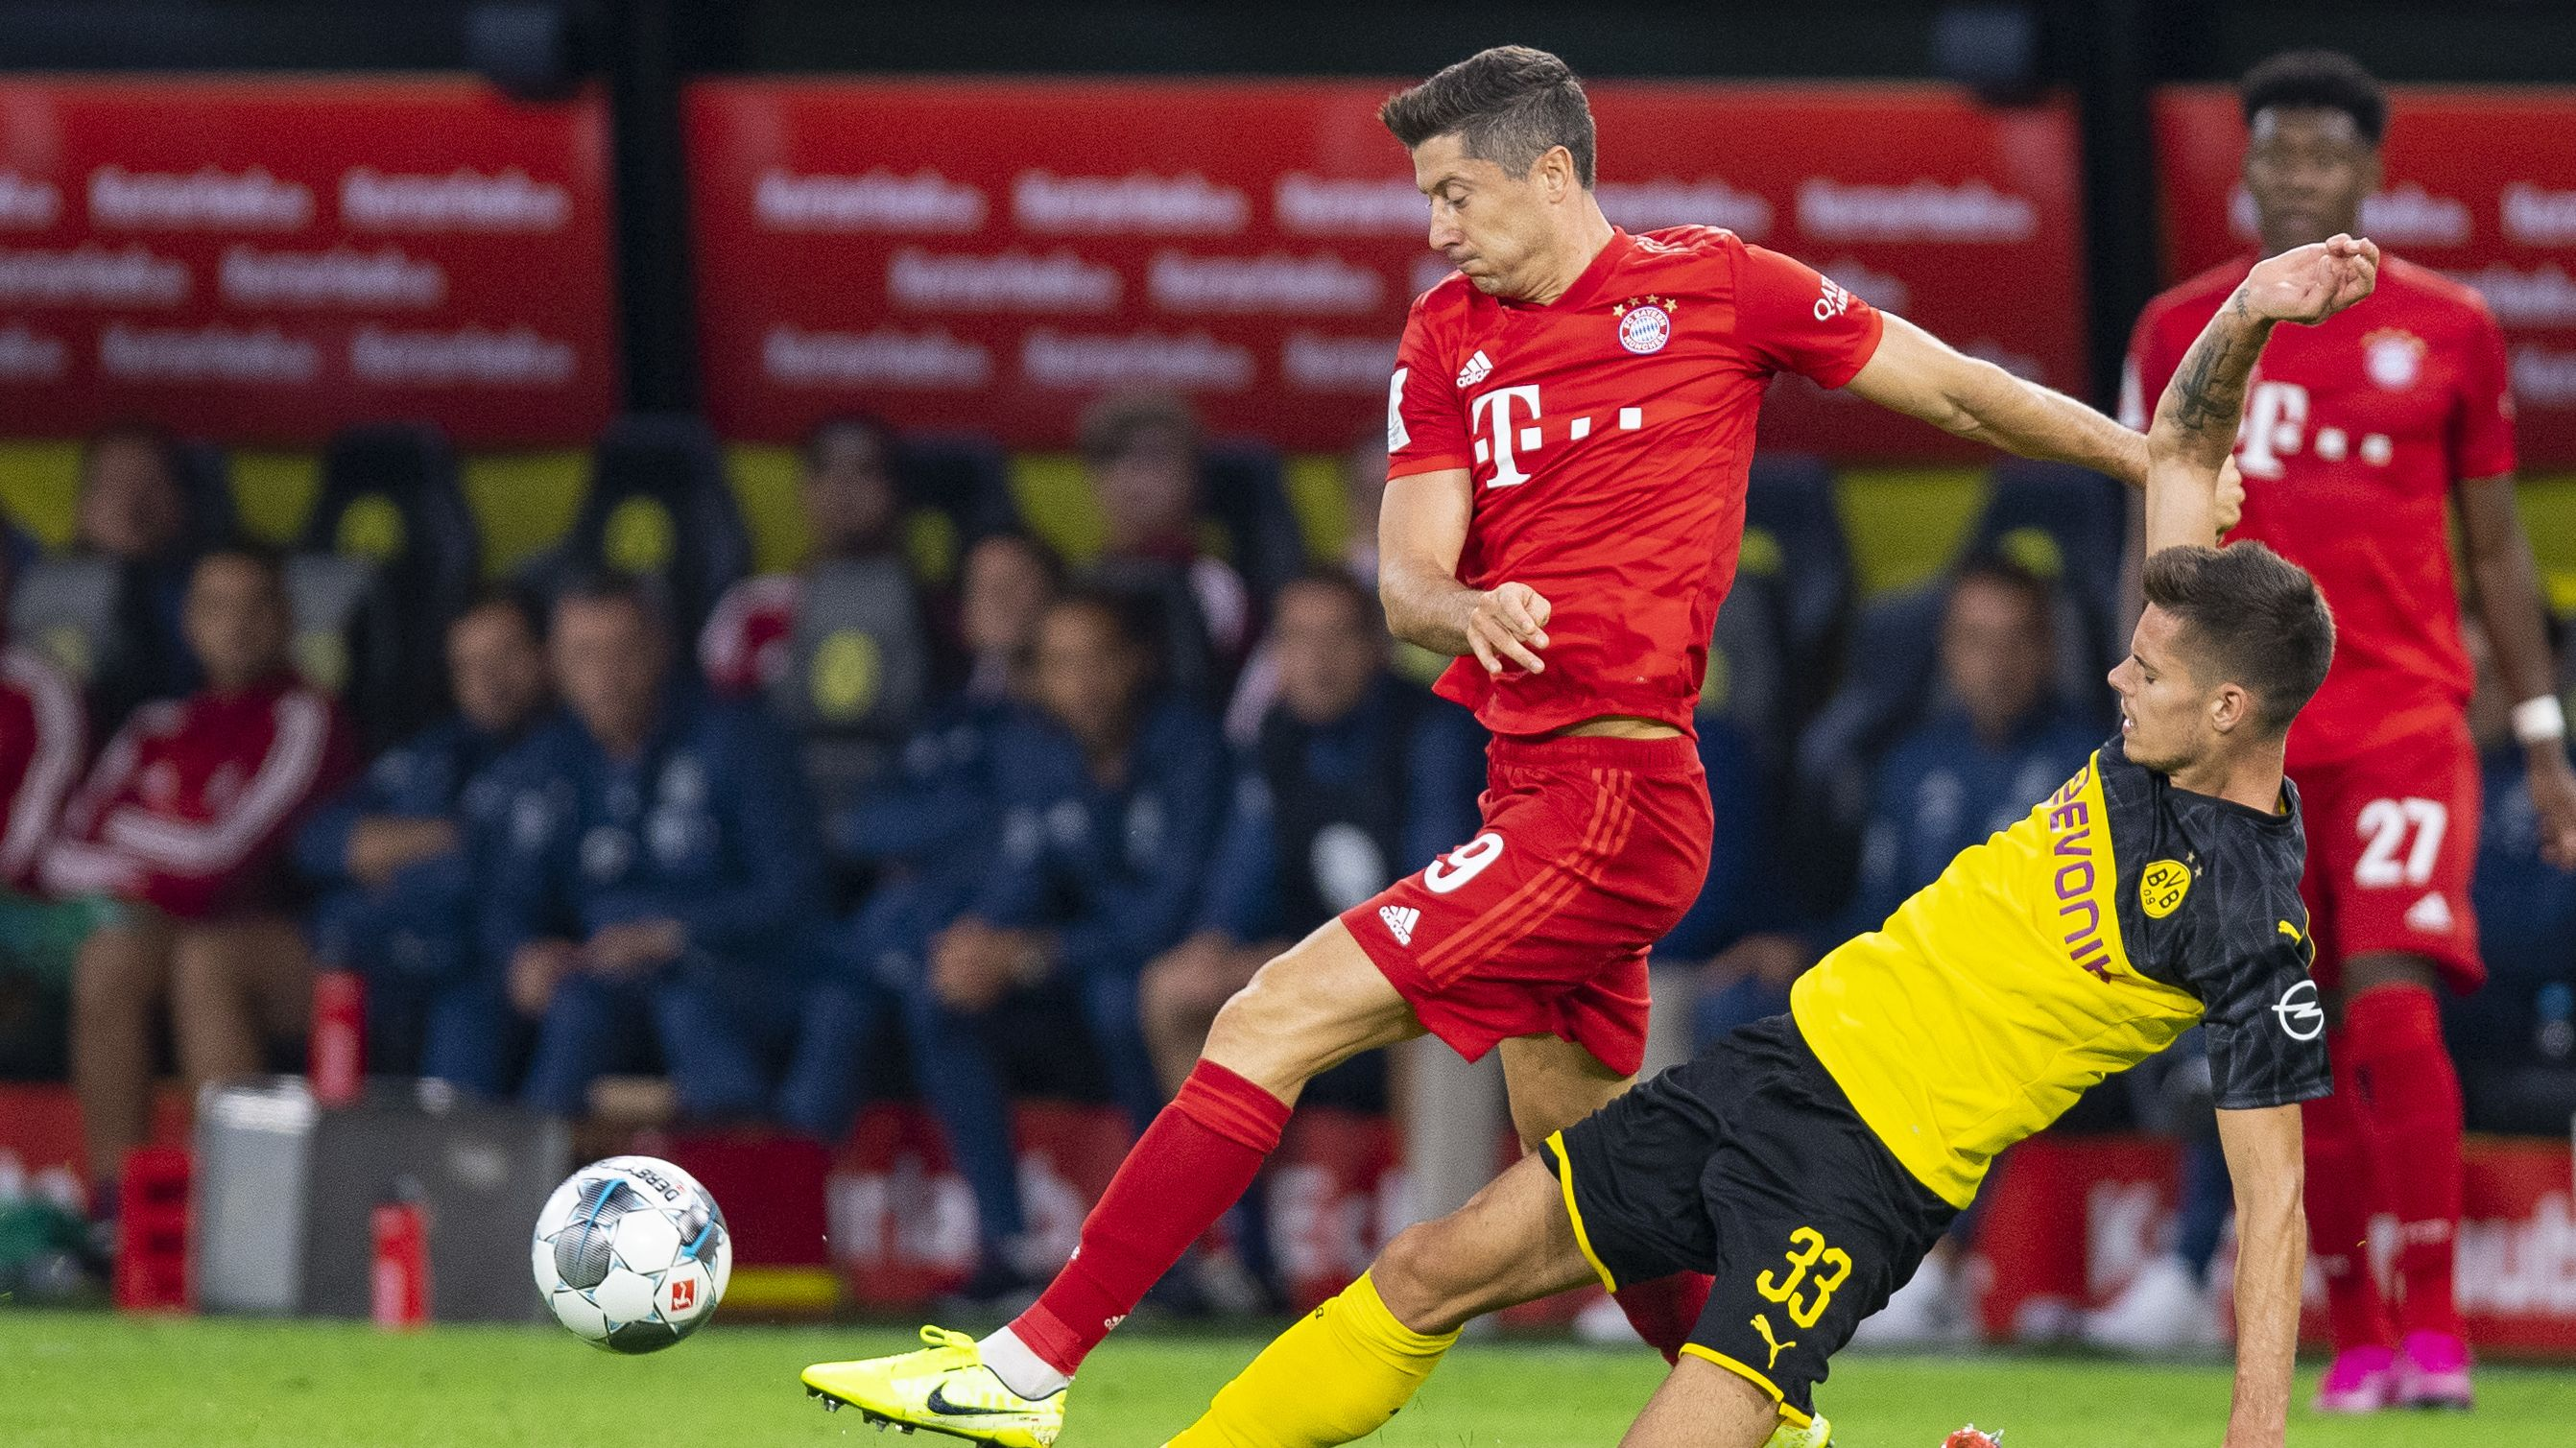 Spielszene Borussia Dortmund - FC Bayern